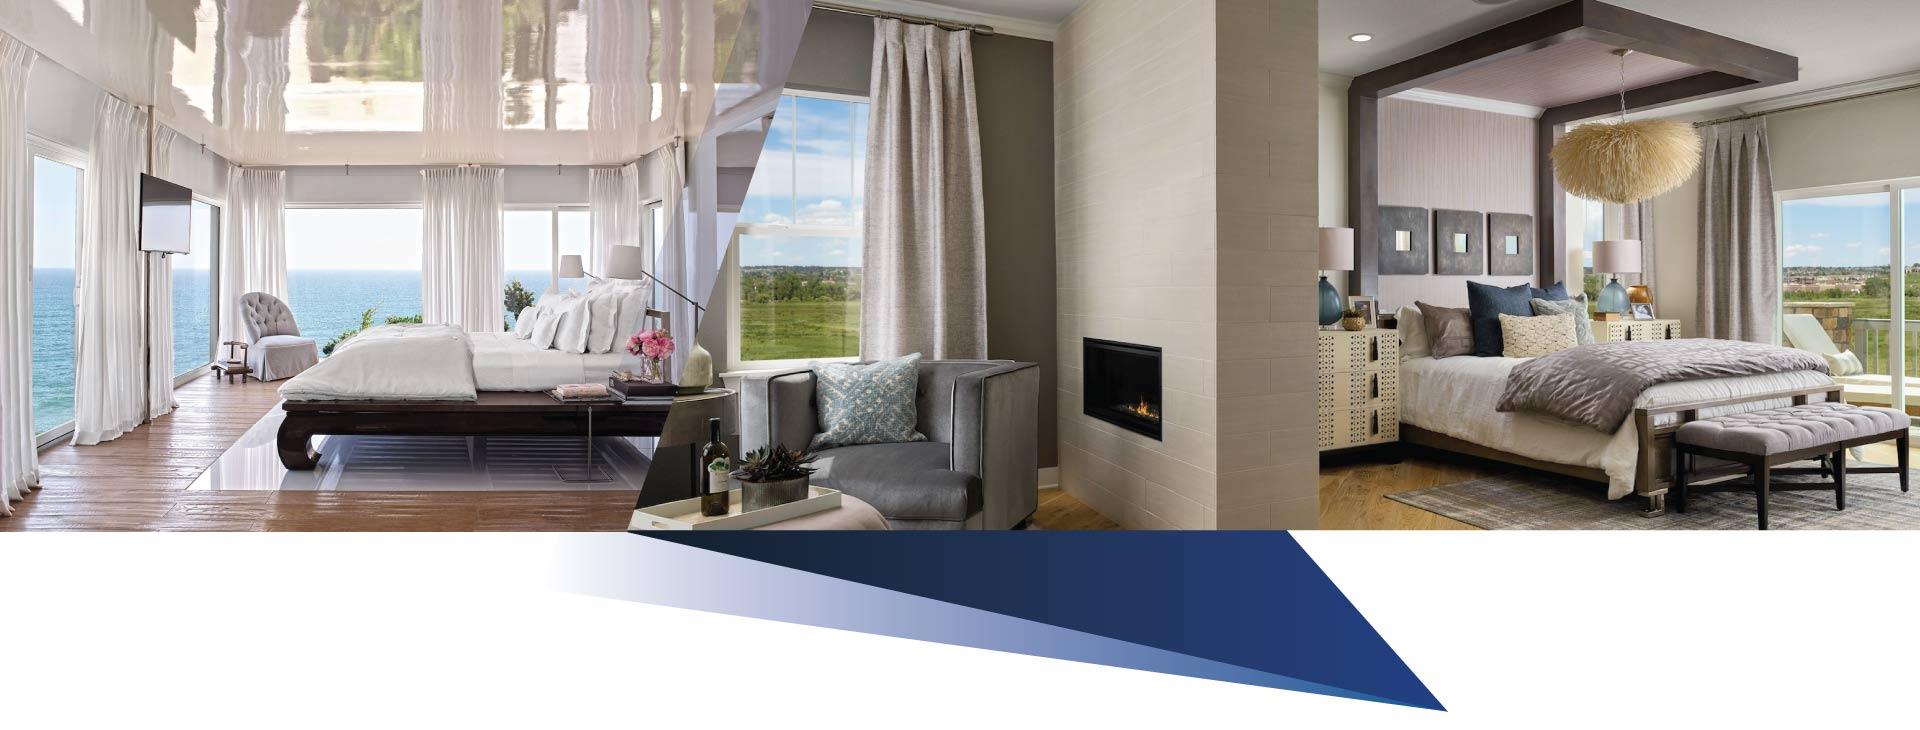 Color in interior design - طراحی اتاق خواب مستر